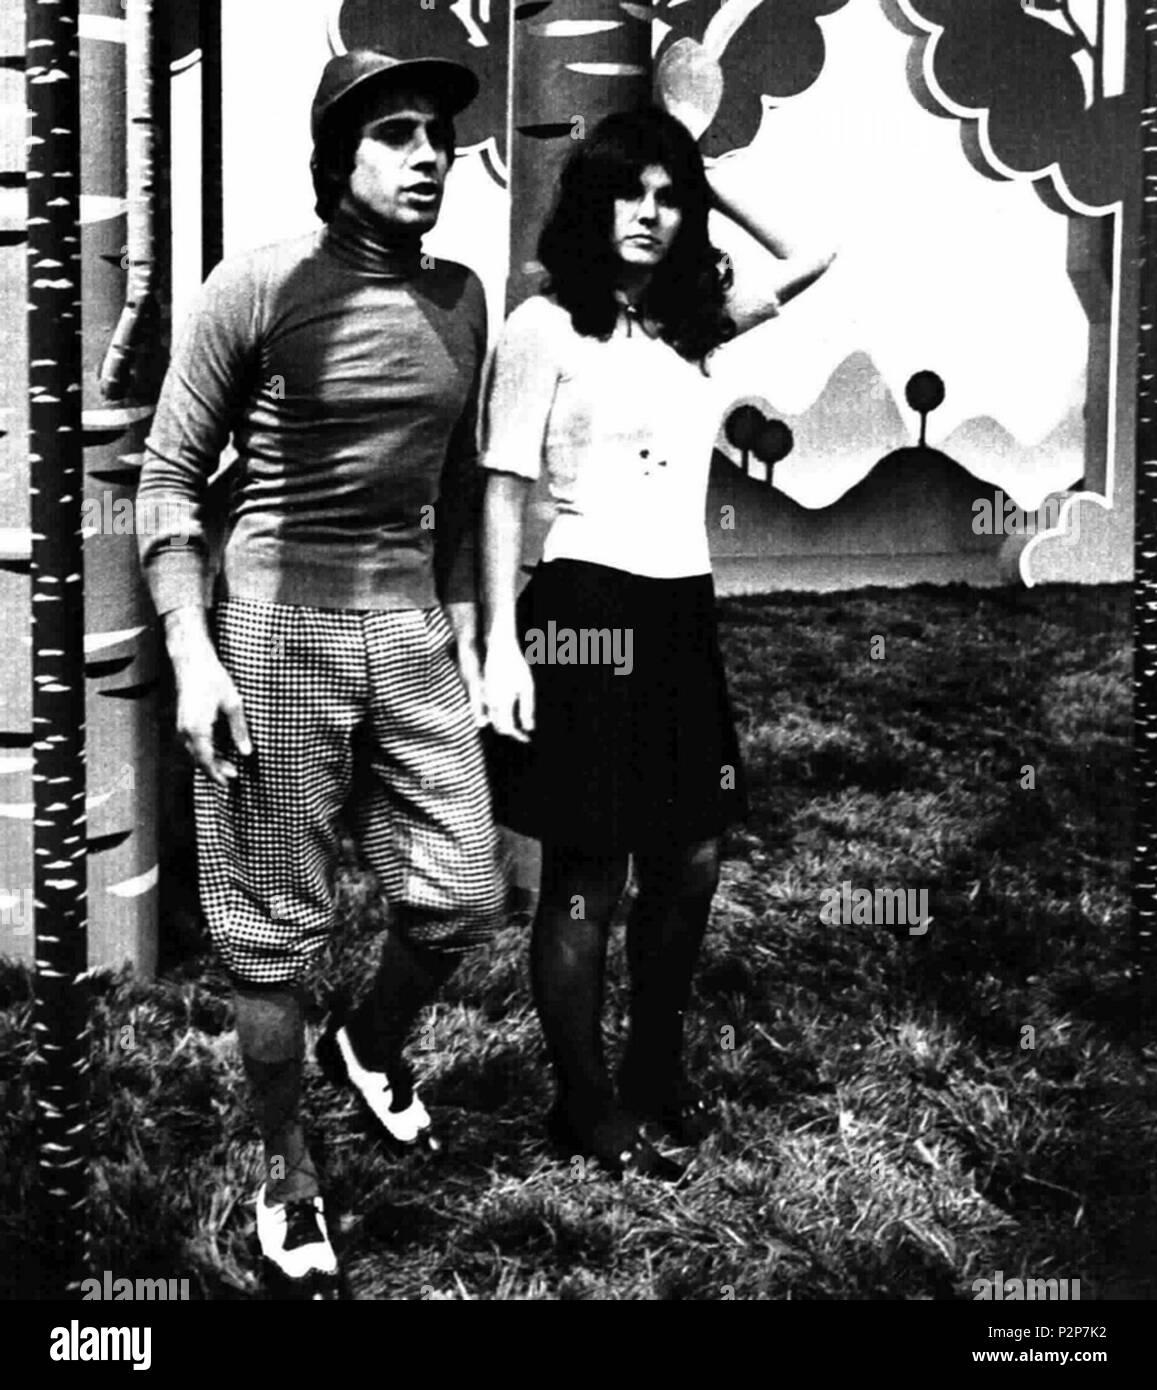 . Italian singers Adriano Celentano and Claudia Mori . May 1972. Unknown 4 Adriano Celentano and Claudia Mori - Stock Image